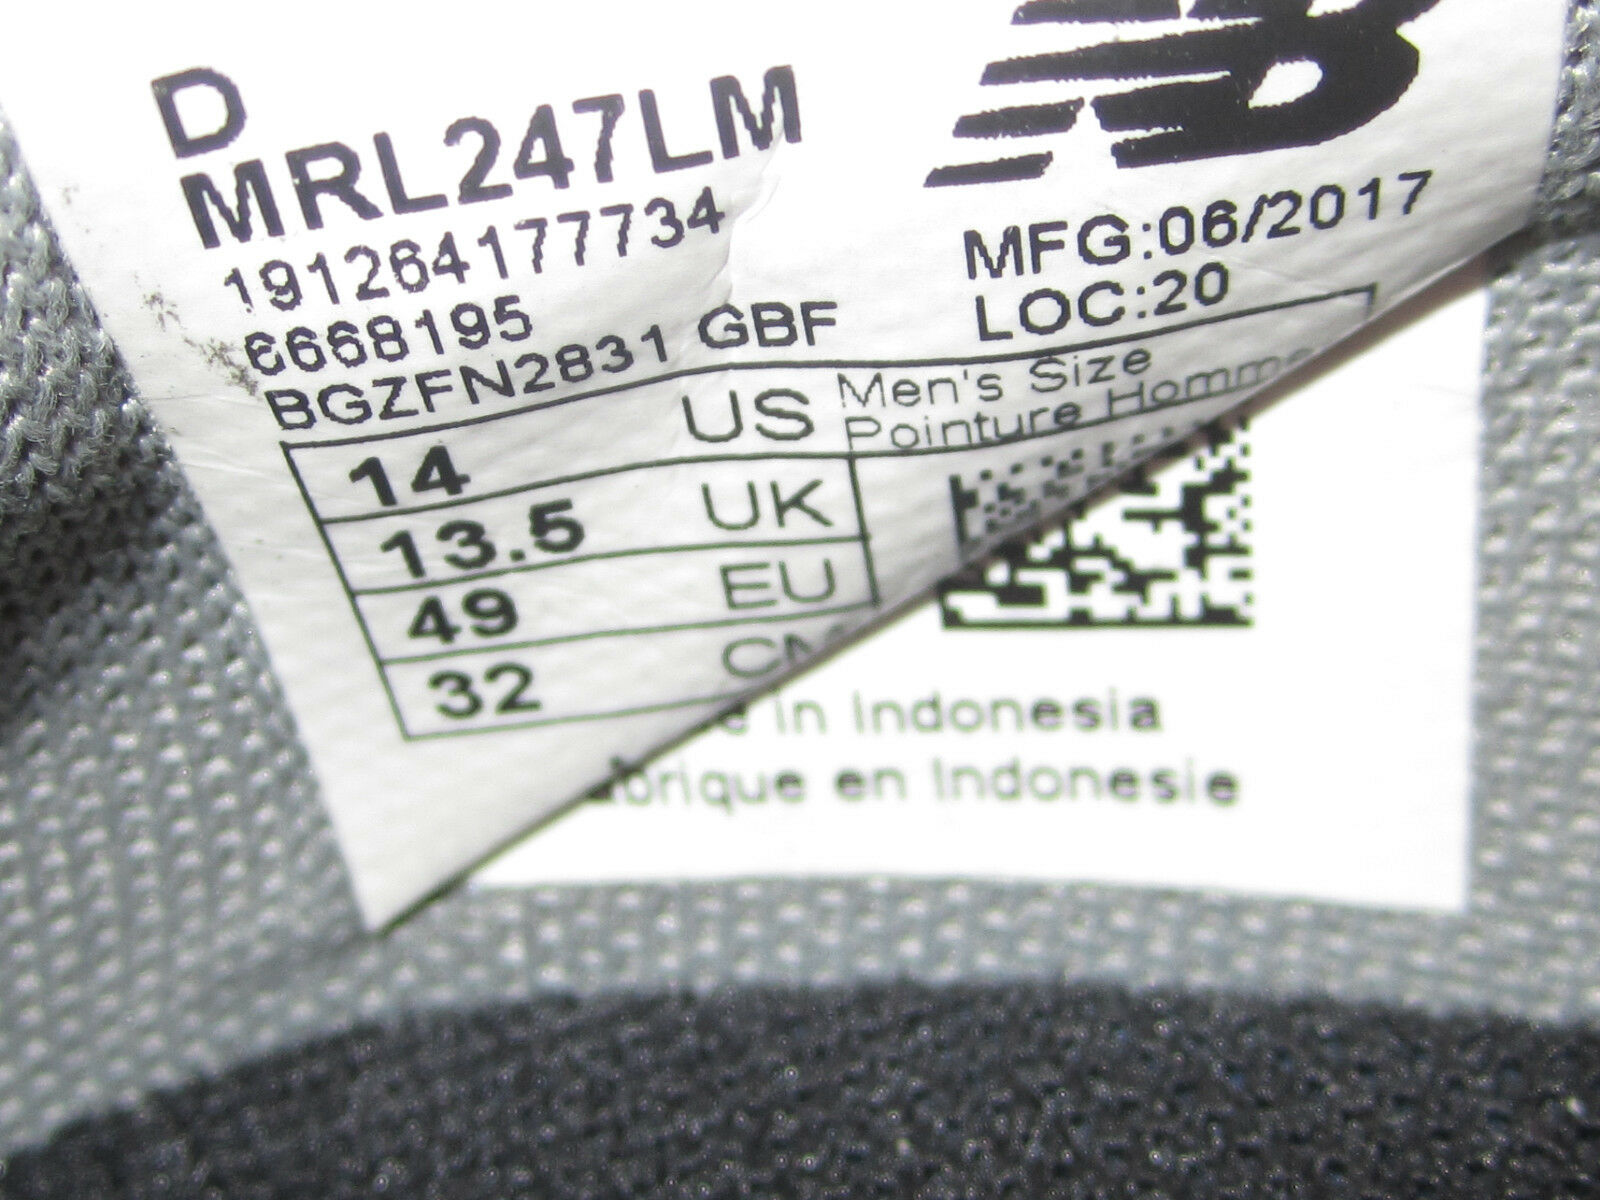 new balance 247 rev - stricken in burgandy grau / schwarz / burgandy in mens mrl247lm größe. 6ae182